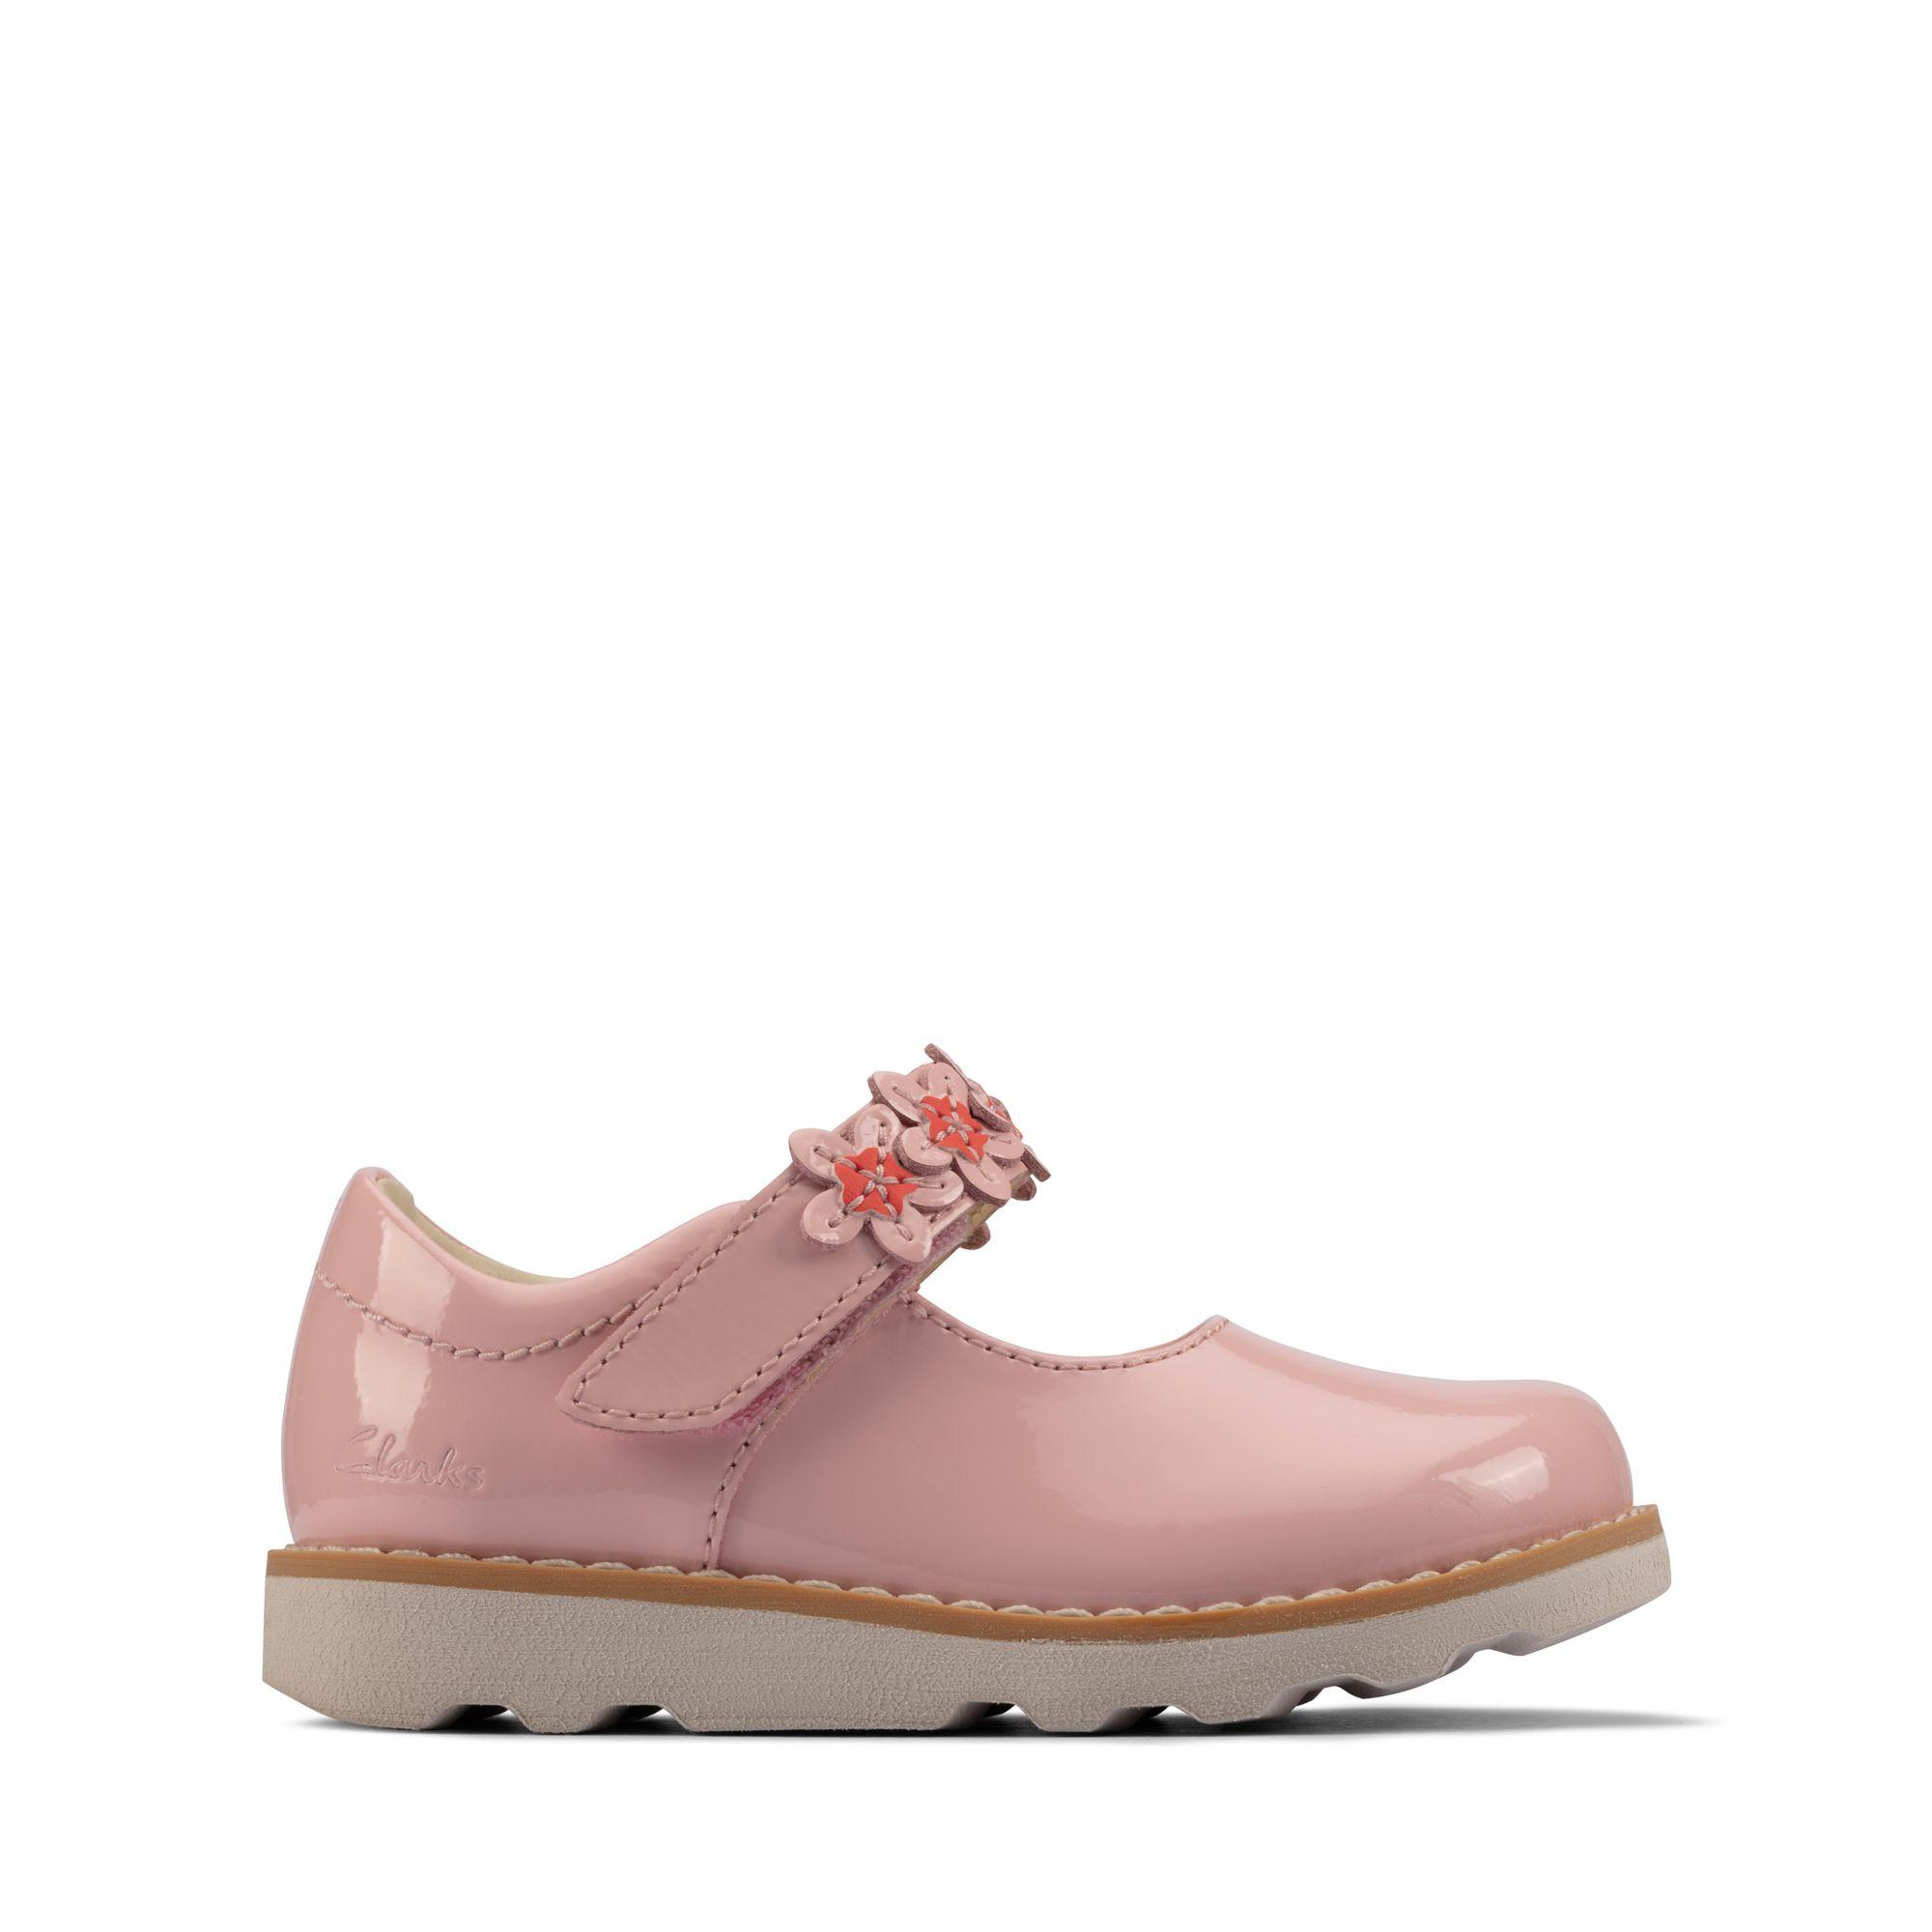 Clarks Crown Petal Toddler – Leather